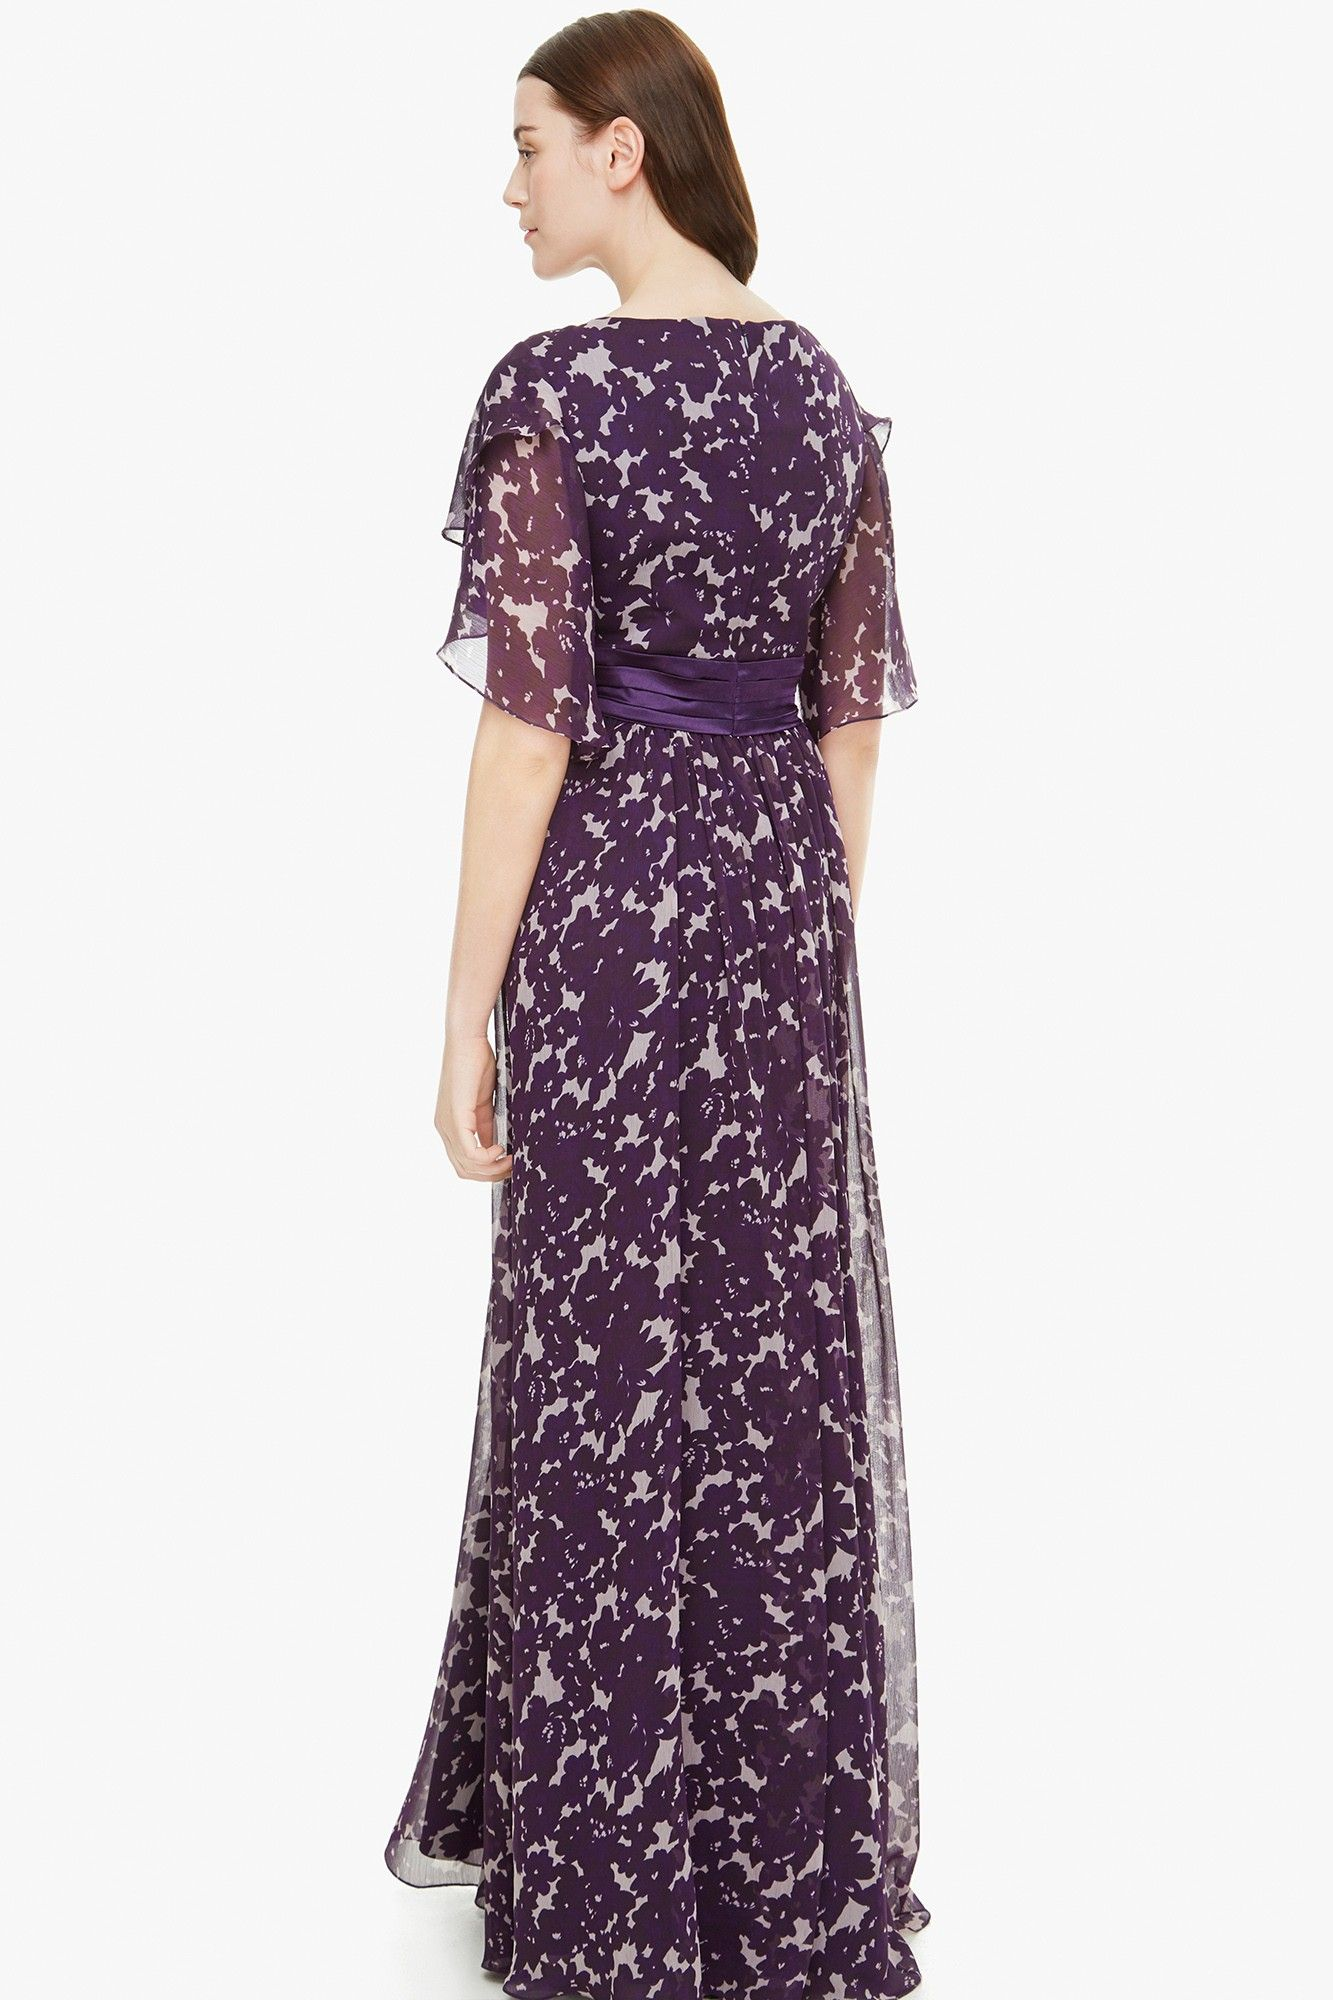 Vestido largo floral - Cóctel | Adolfo Dominguez shop online ...